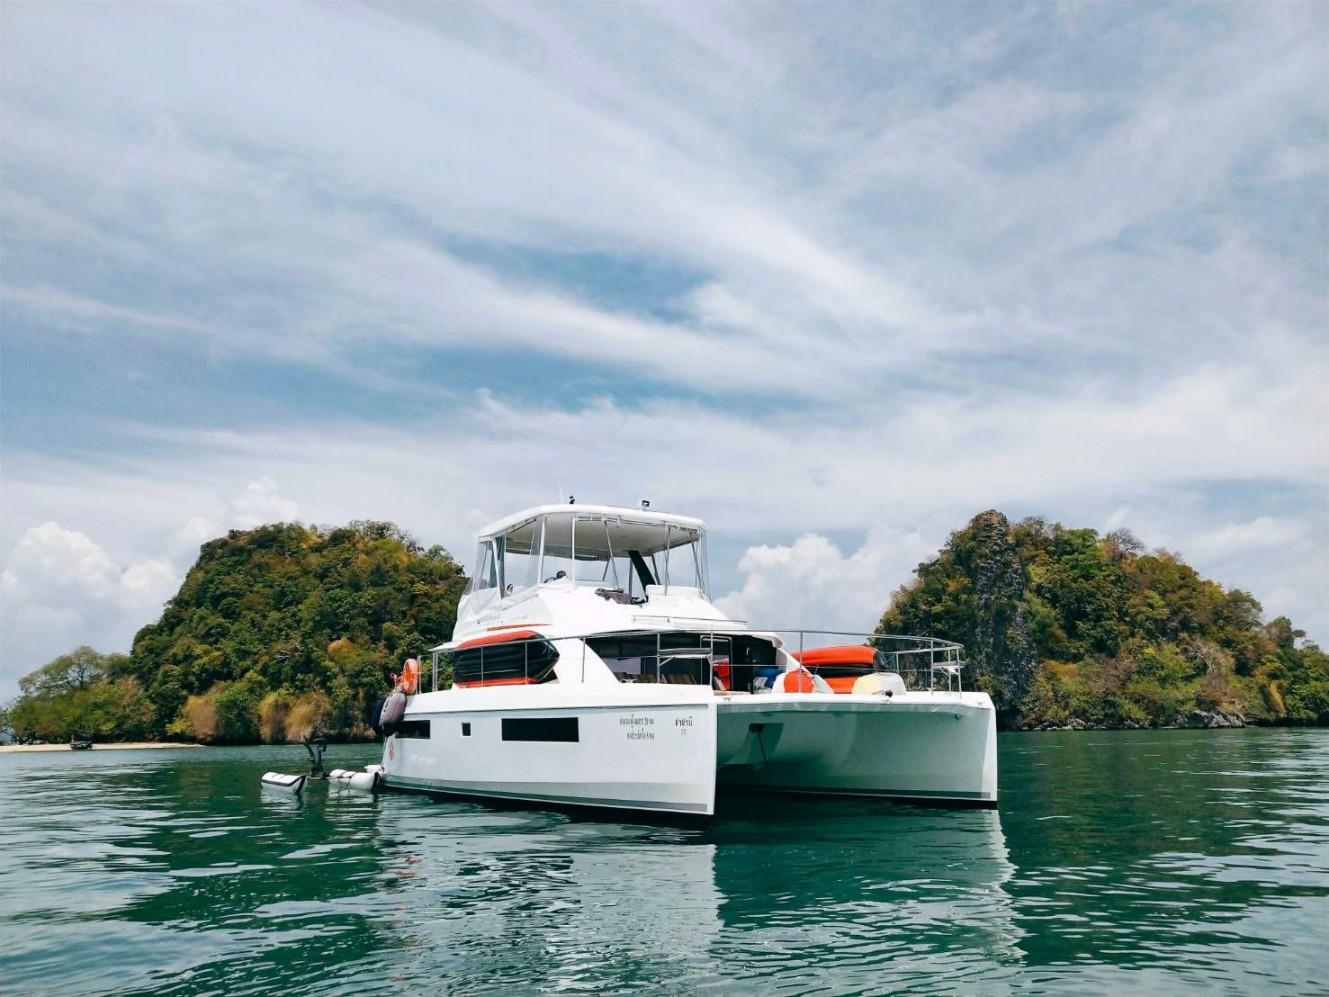 Shasansi-Phucker-thailand-boat